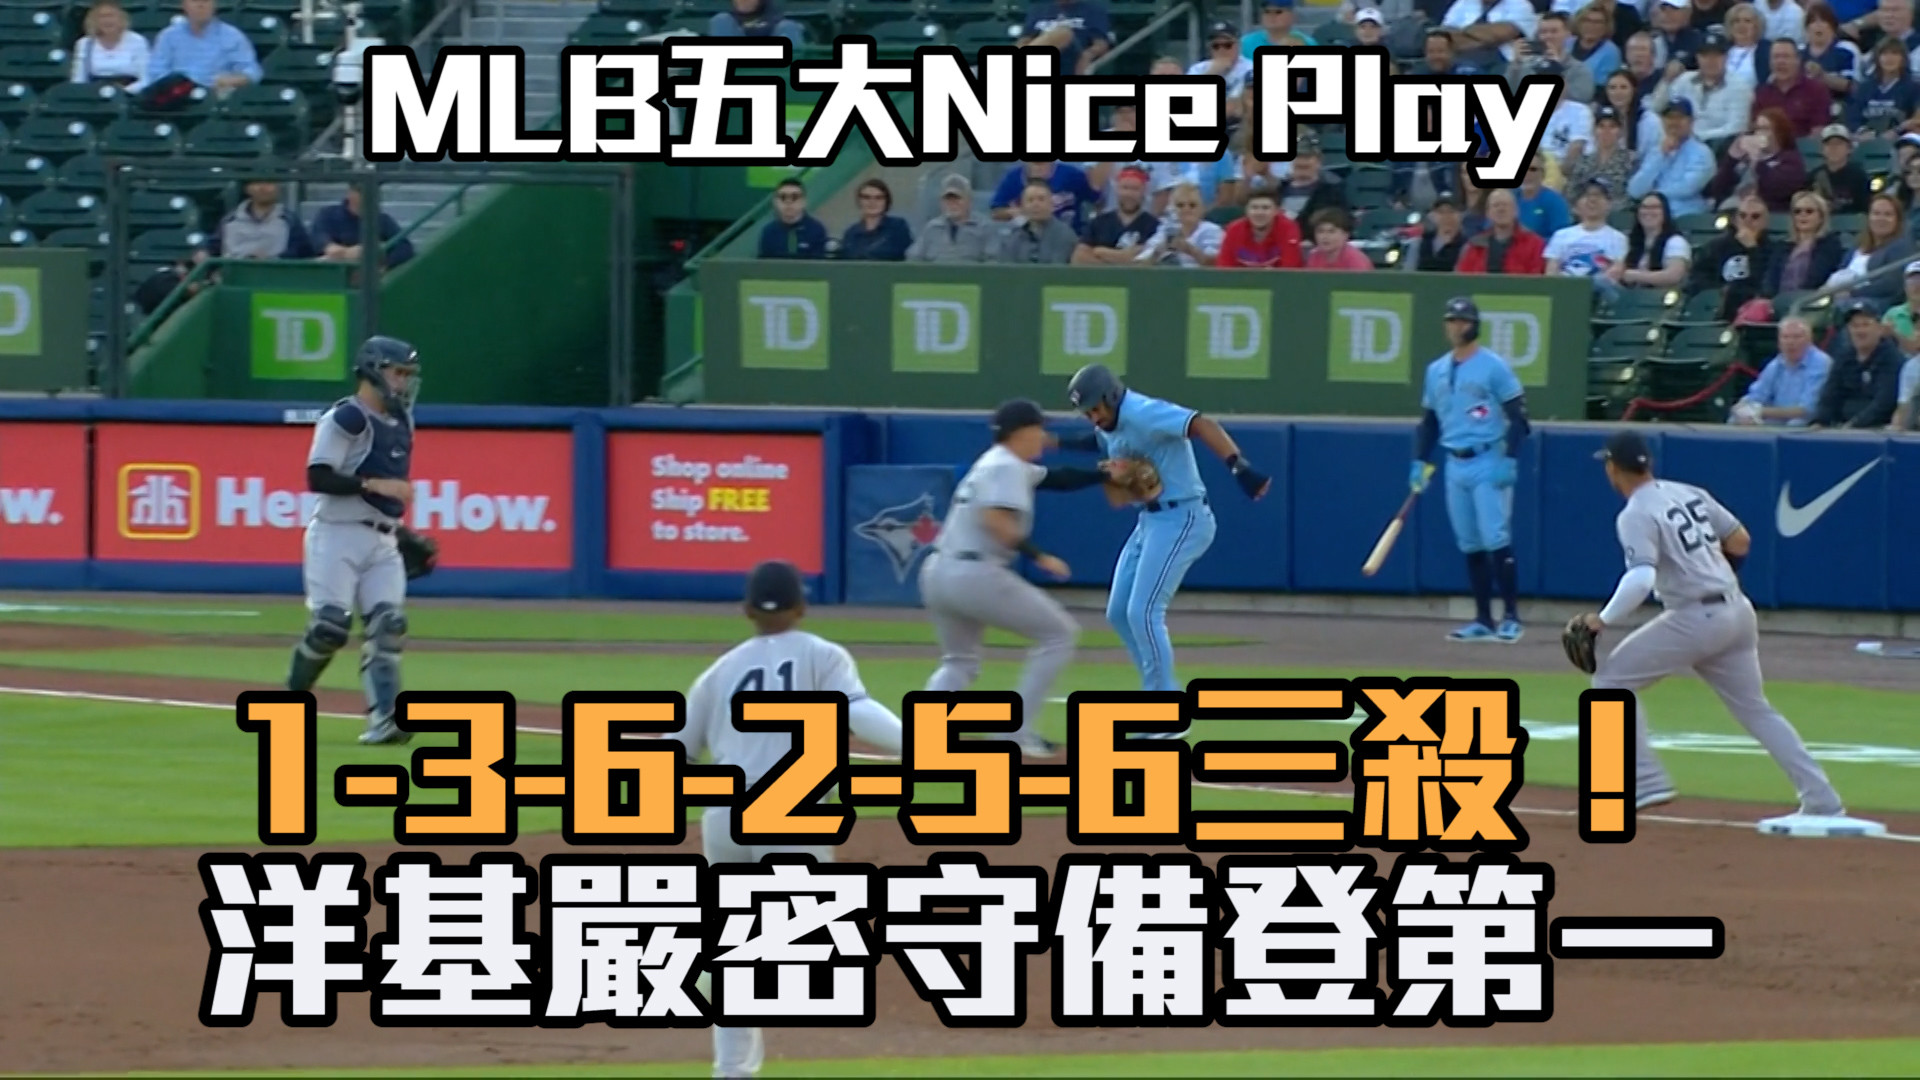 【MLB看愛爾達】MLB五大Nice Play 高難度守備大飽眼福 06/18